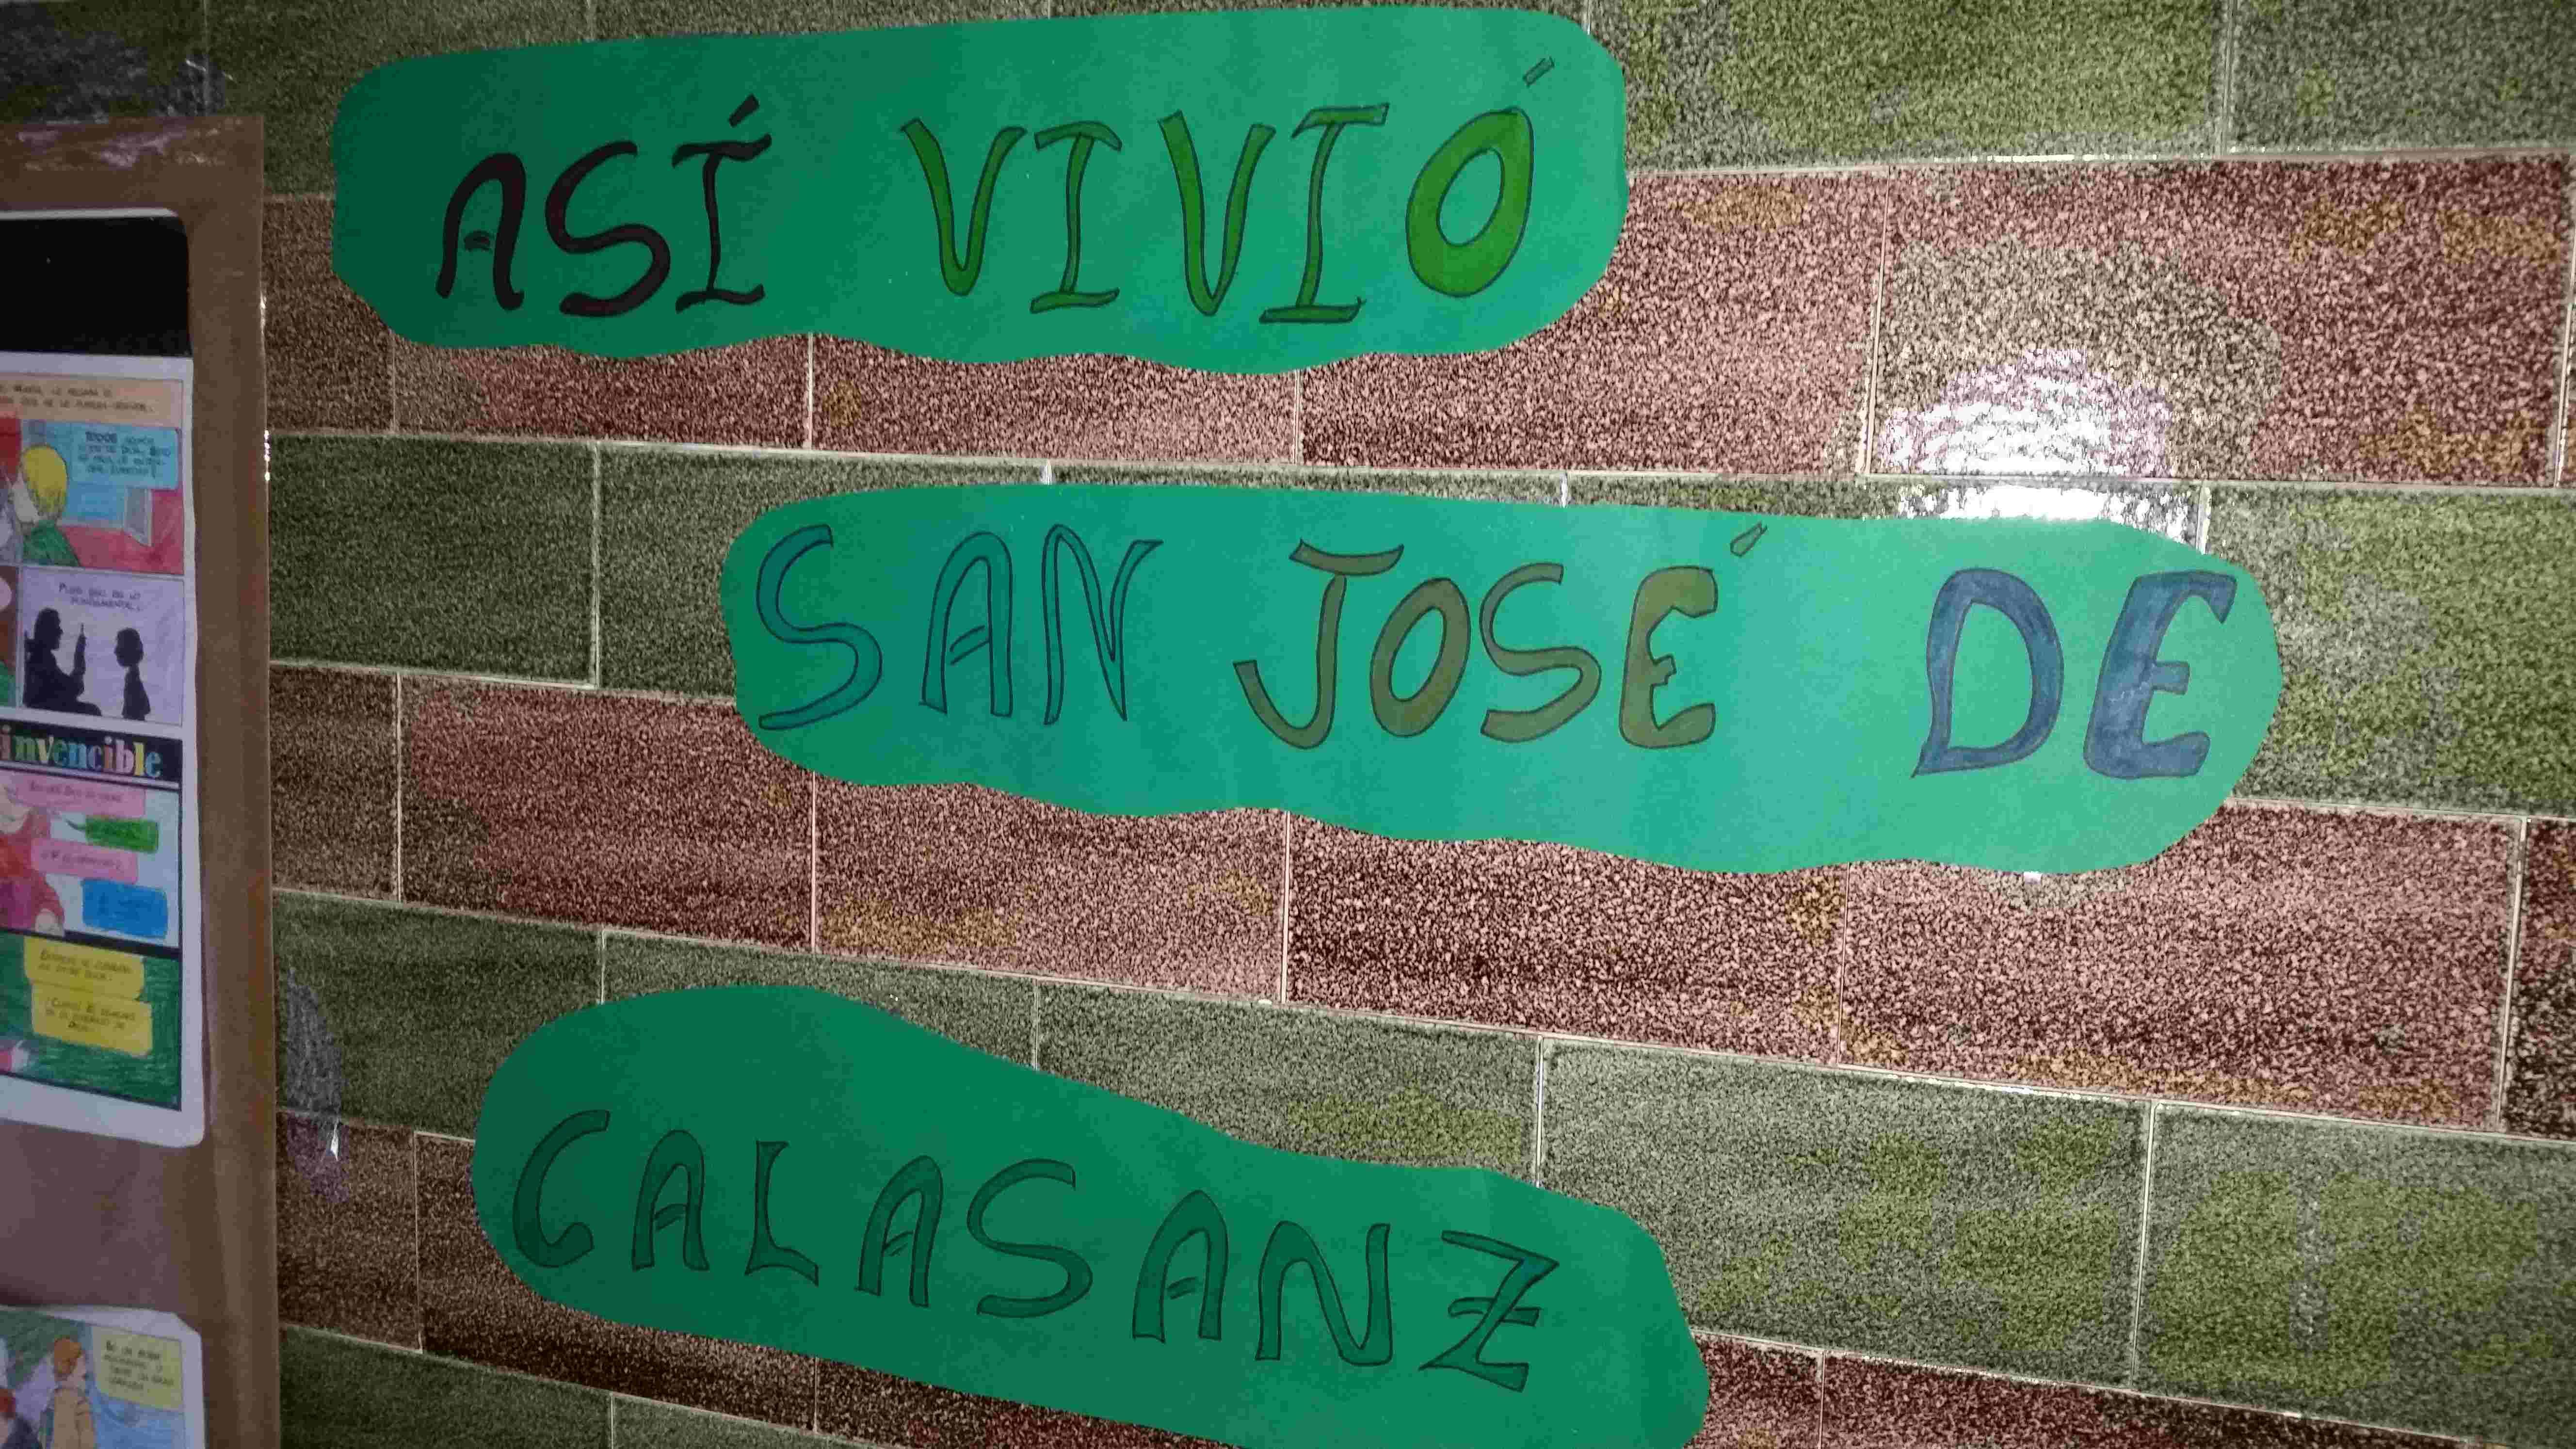 San josé de Calasanz San josé de Calasanz San josé de Calasanz 20141127_105145